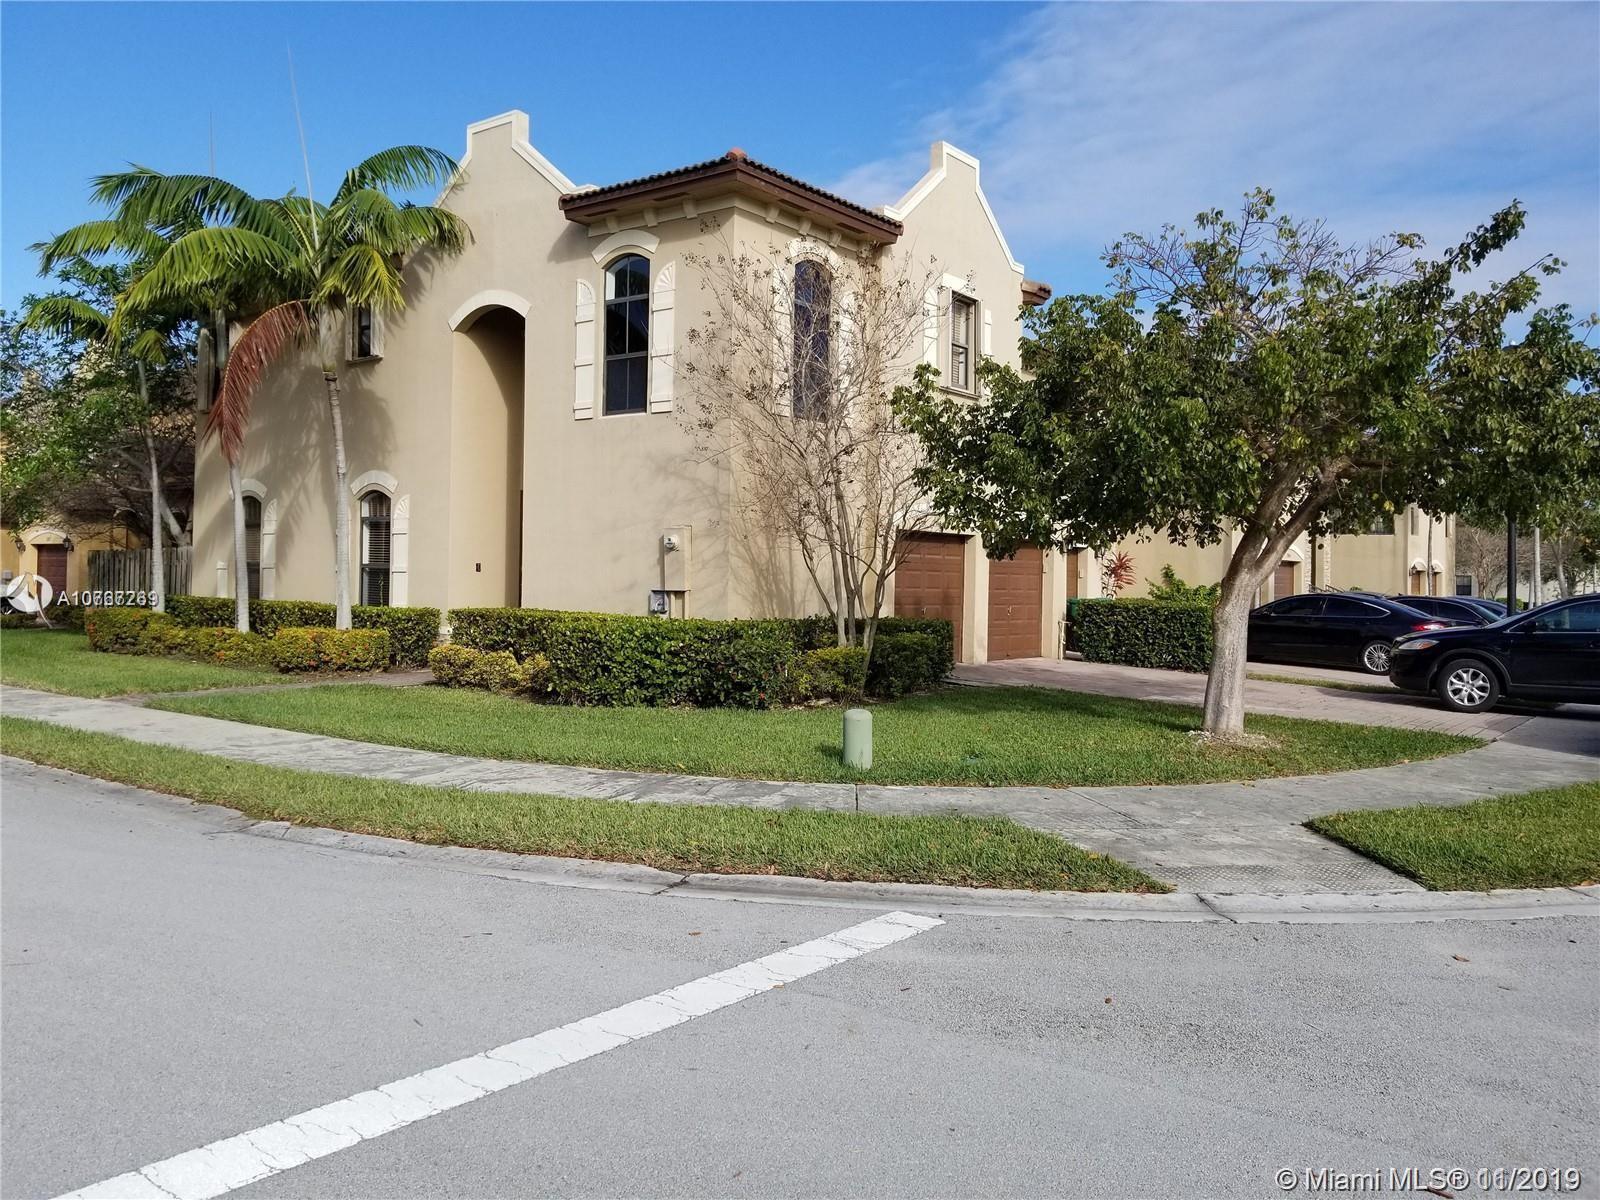 23684 SW 113th Ave #4, Homestead, FL 33032 - Homestead, FL real estate listing